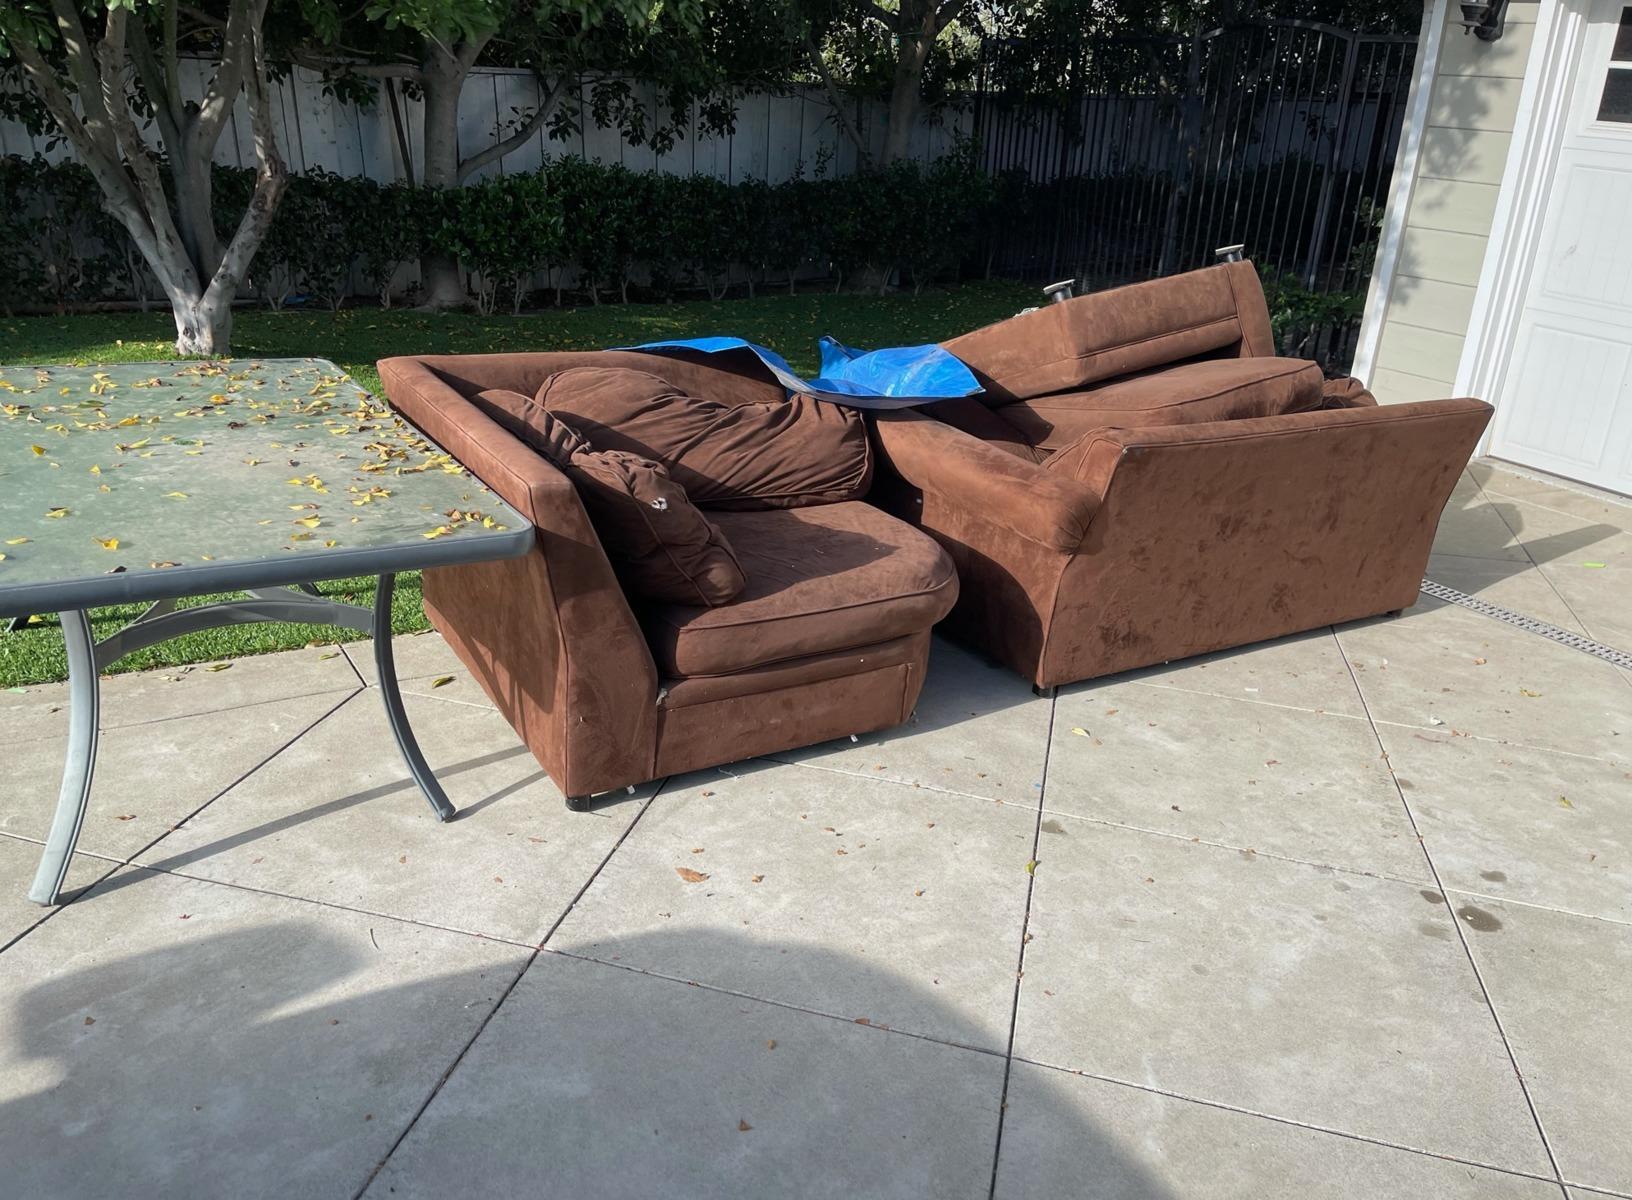 Furniture Removal in San Juan Capistrano, CA - Before Photo